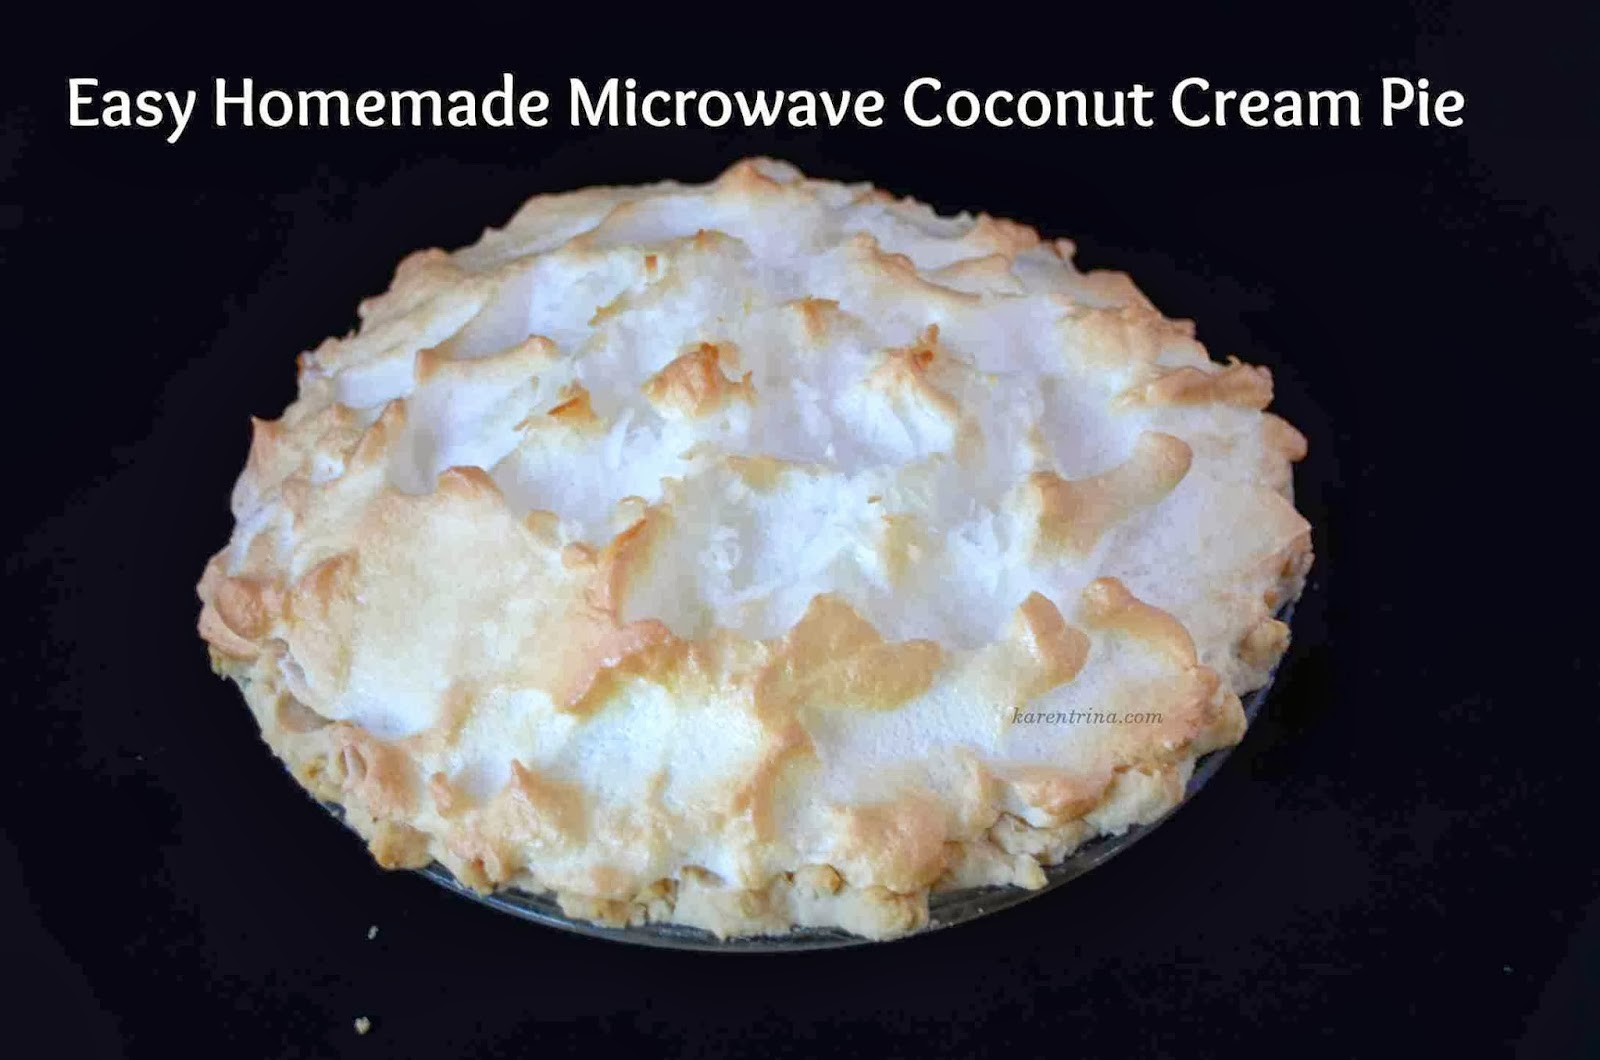 Micrwave coconut pie